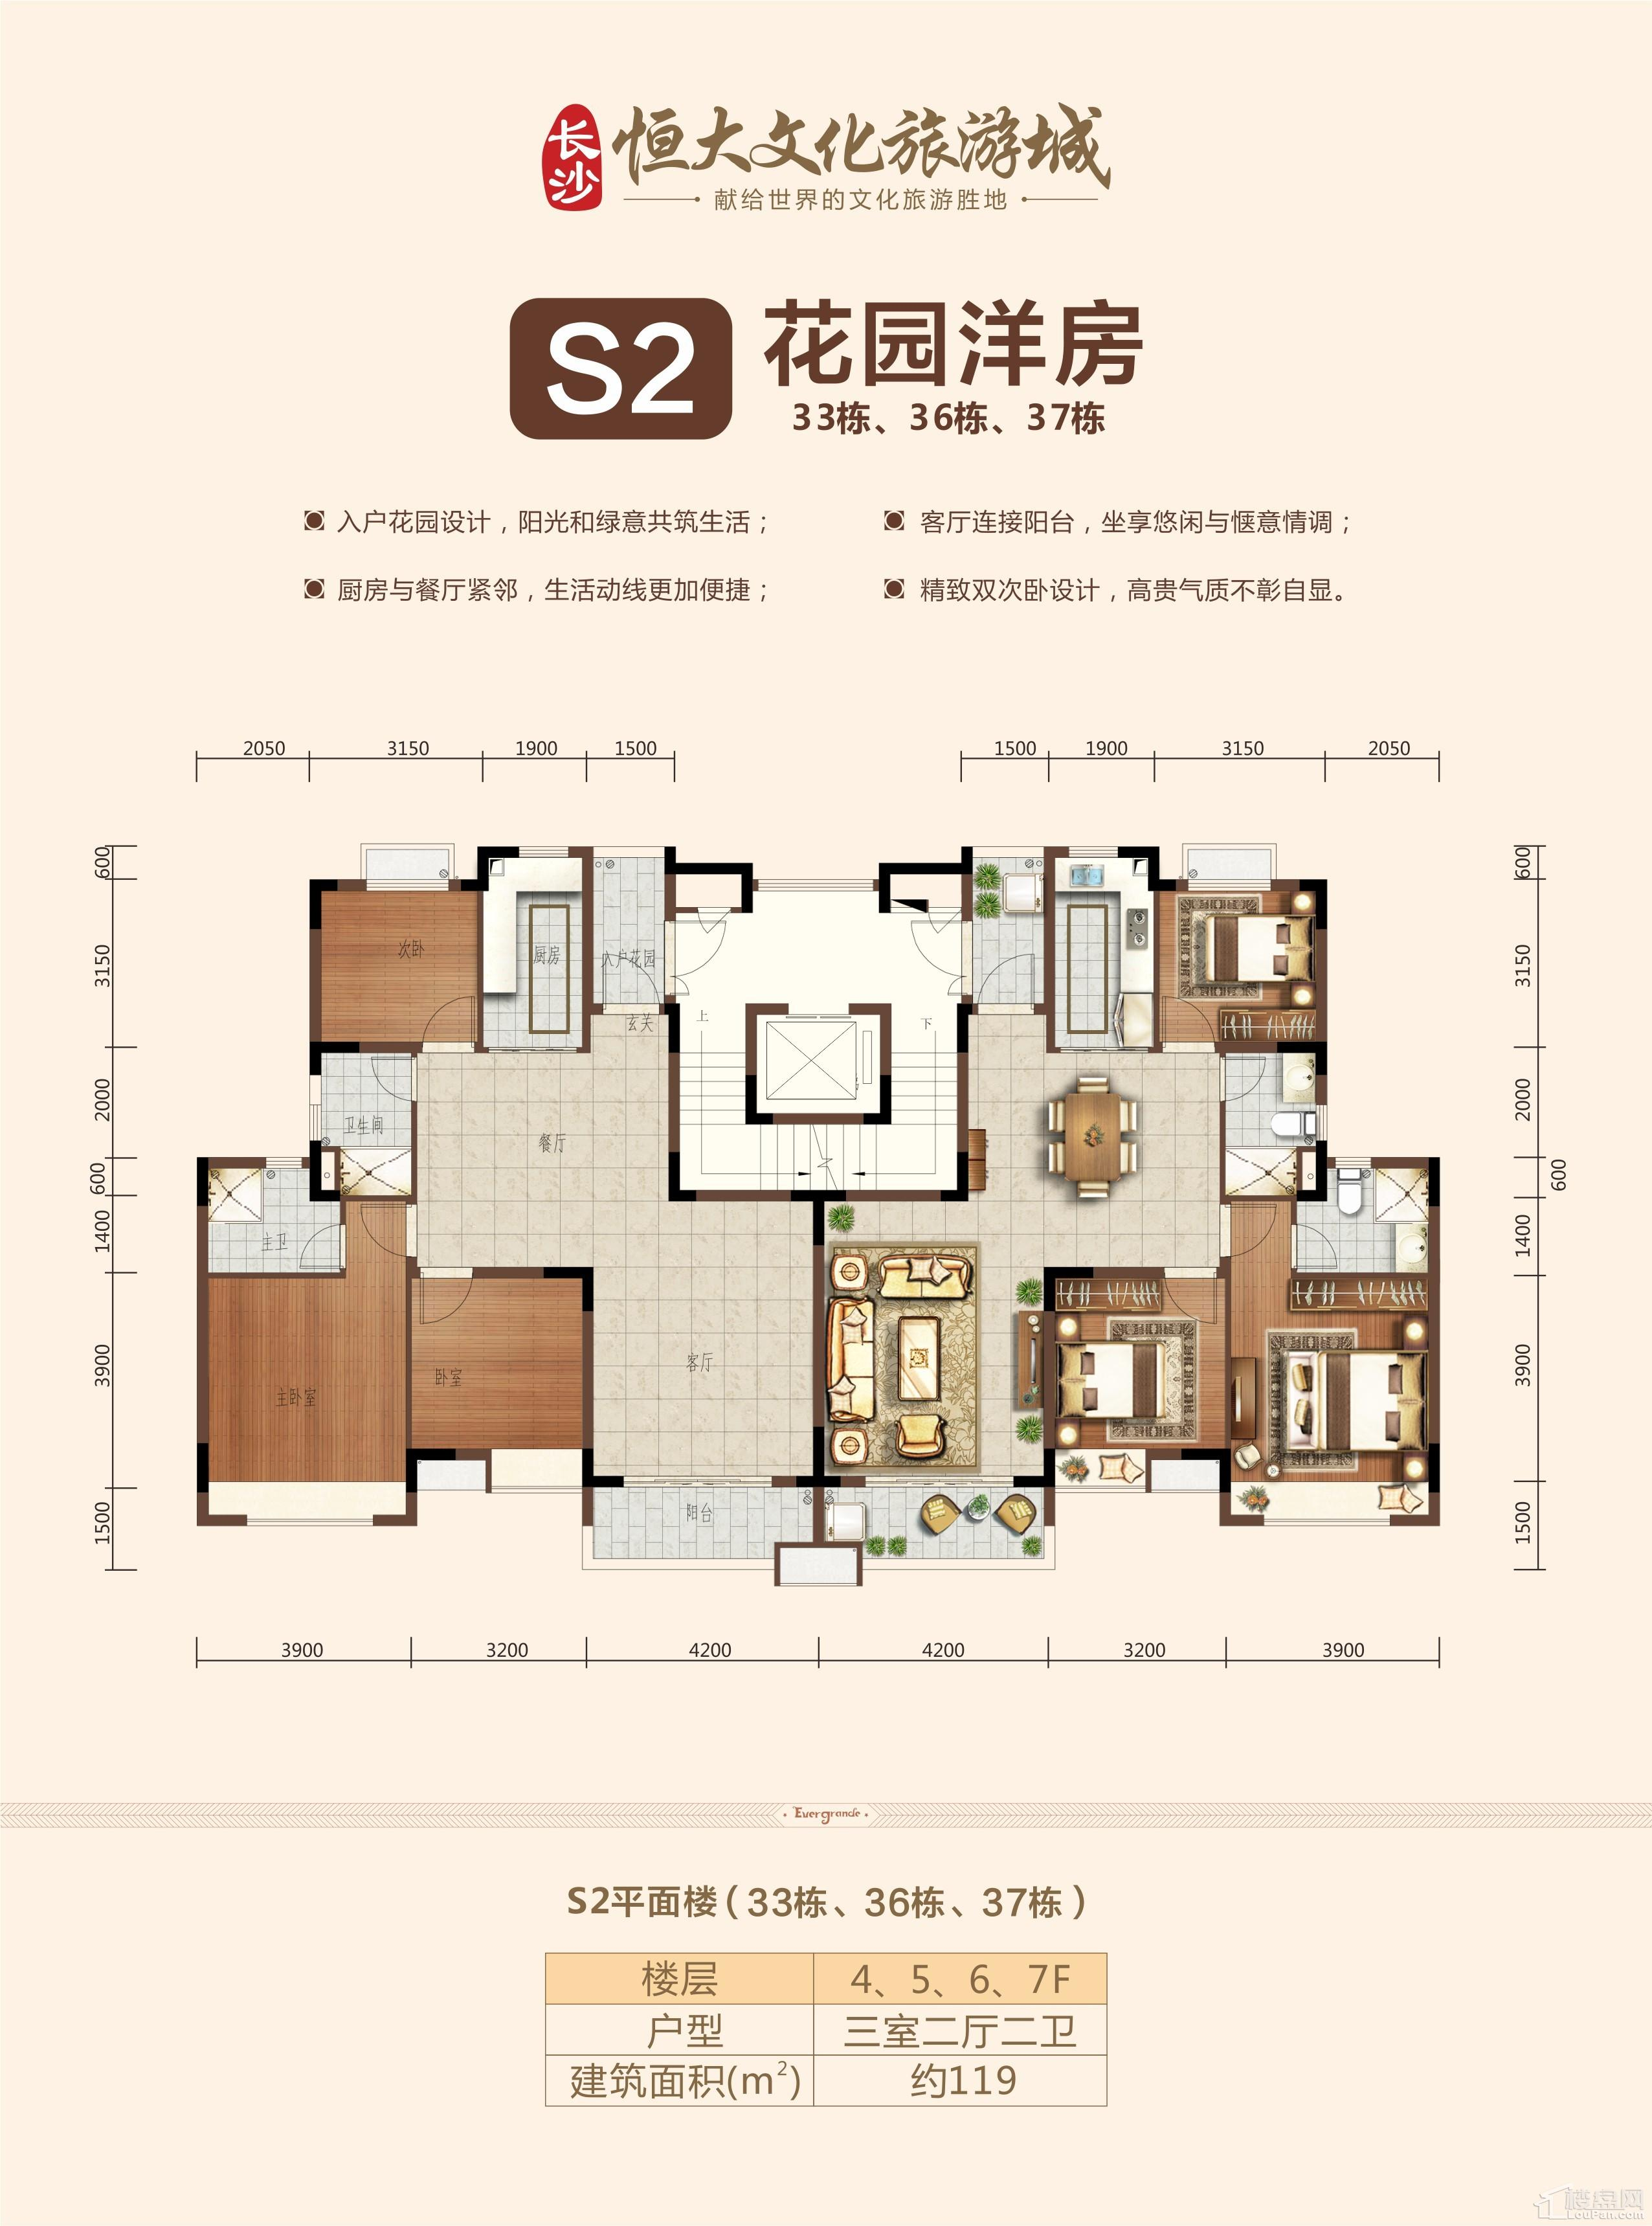 S2花园洋房4-6层